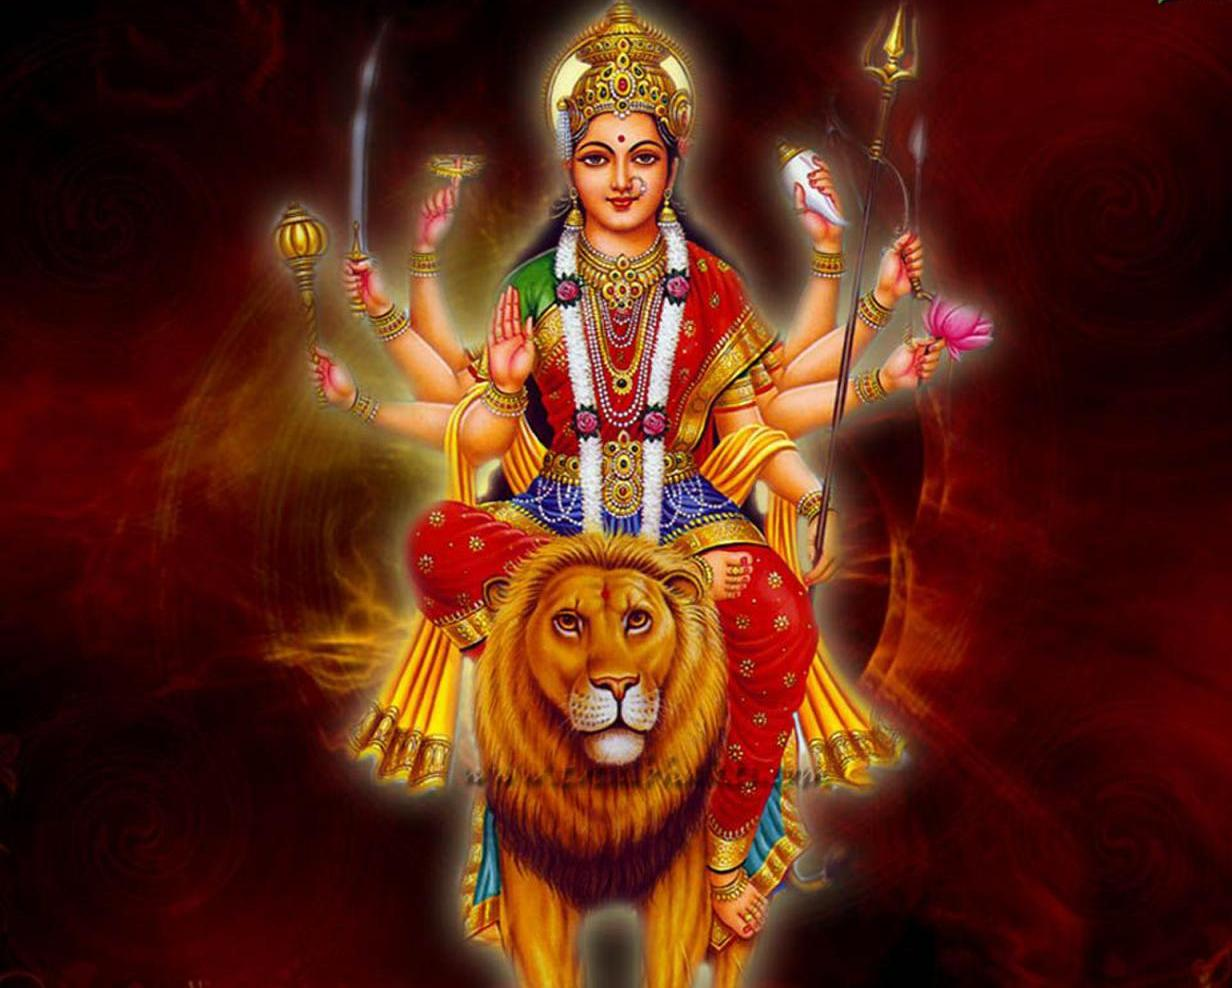 Hindu devotional wallpaper